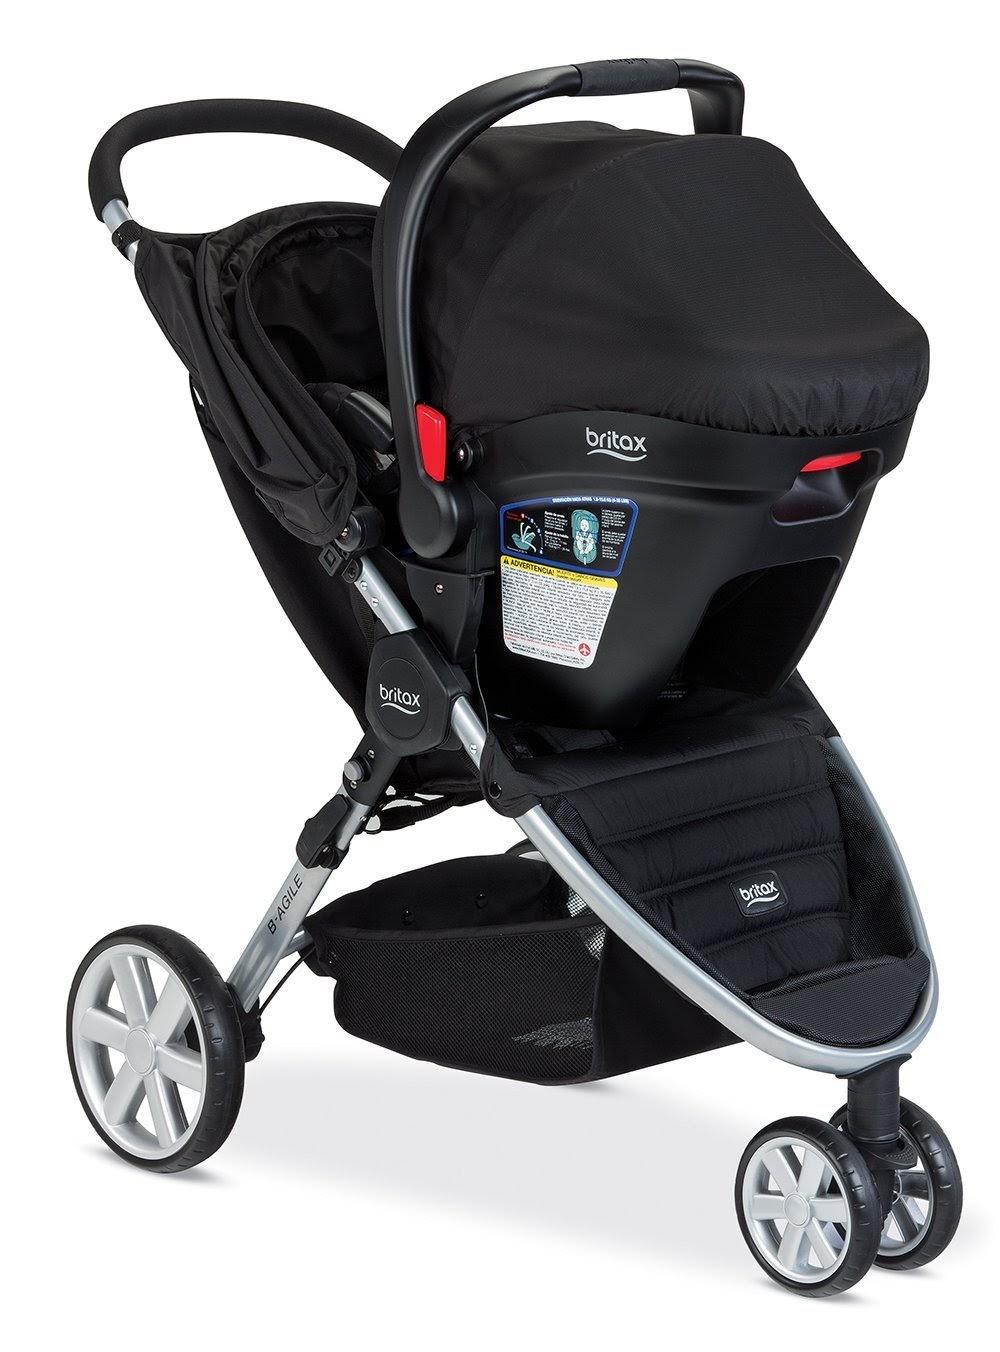 Discount Britax Infant Car Seat